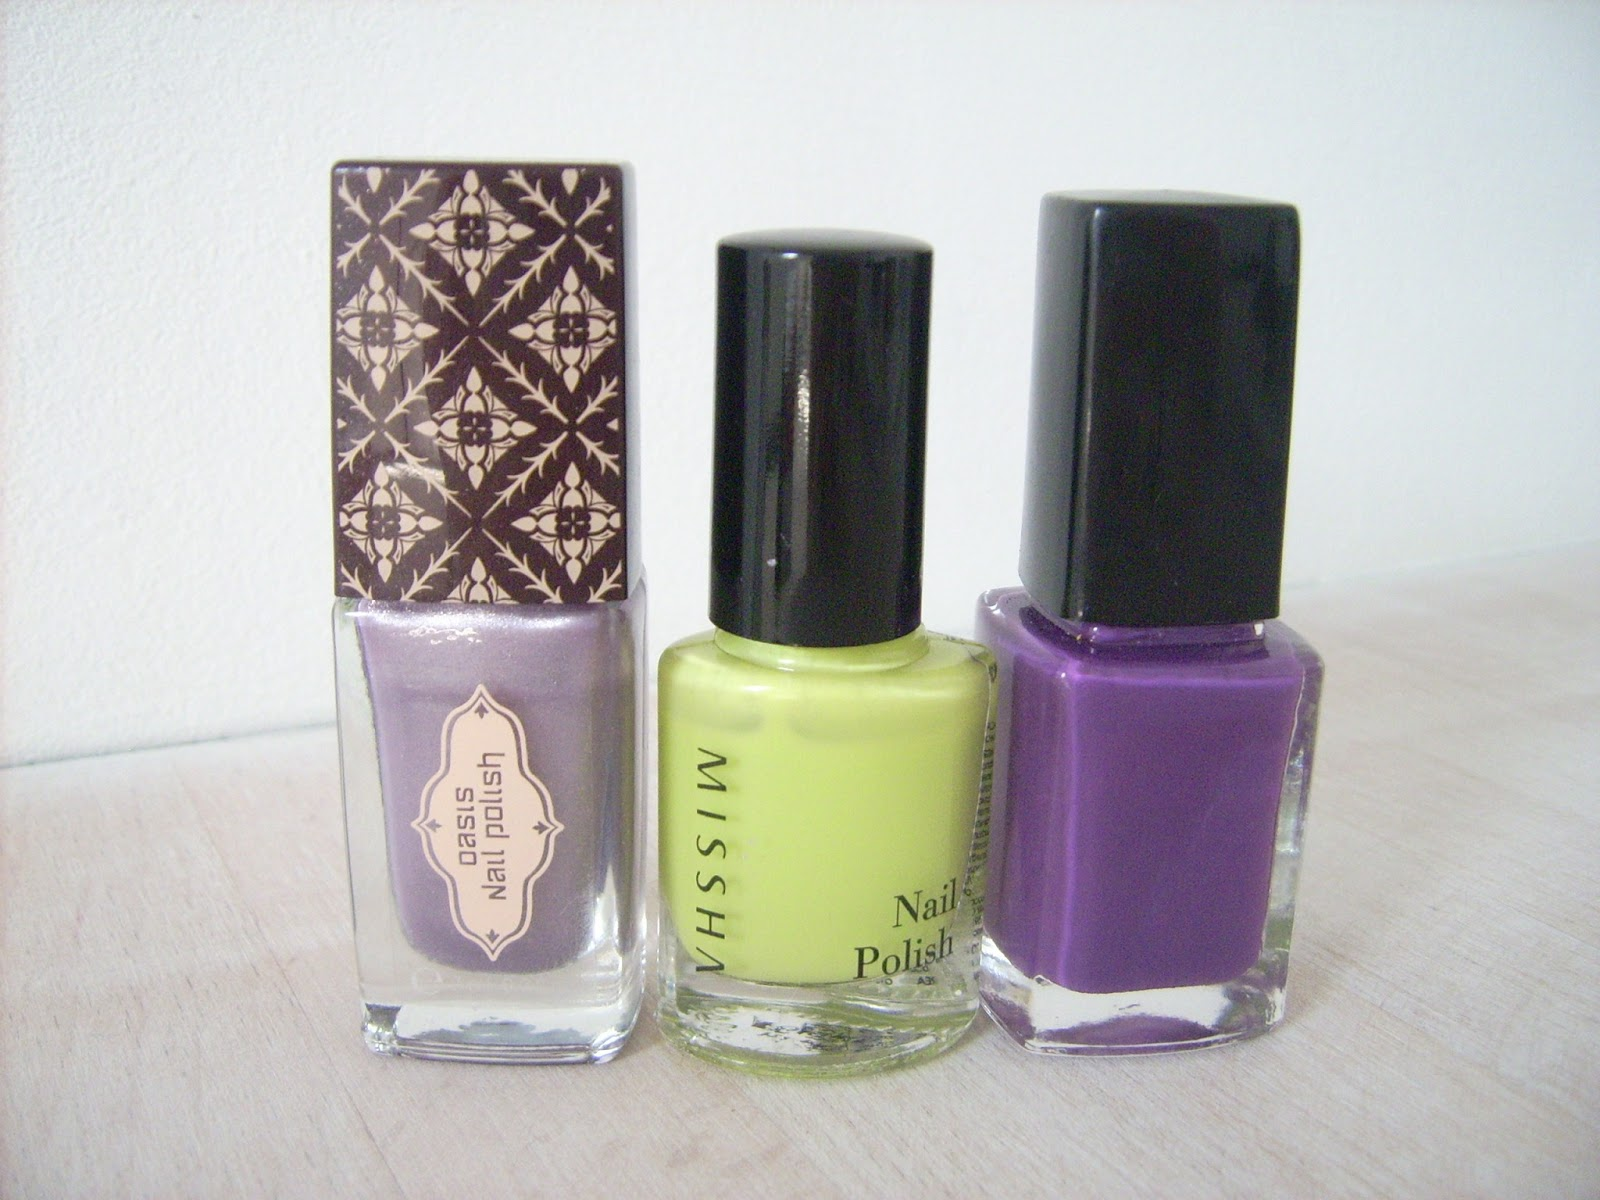 oriflame nail polish purple, missha nail polish GR02